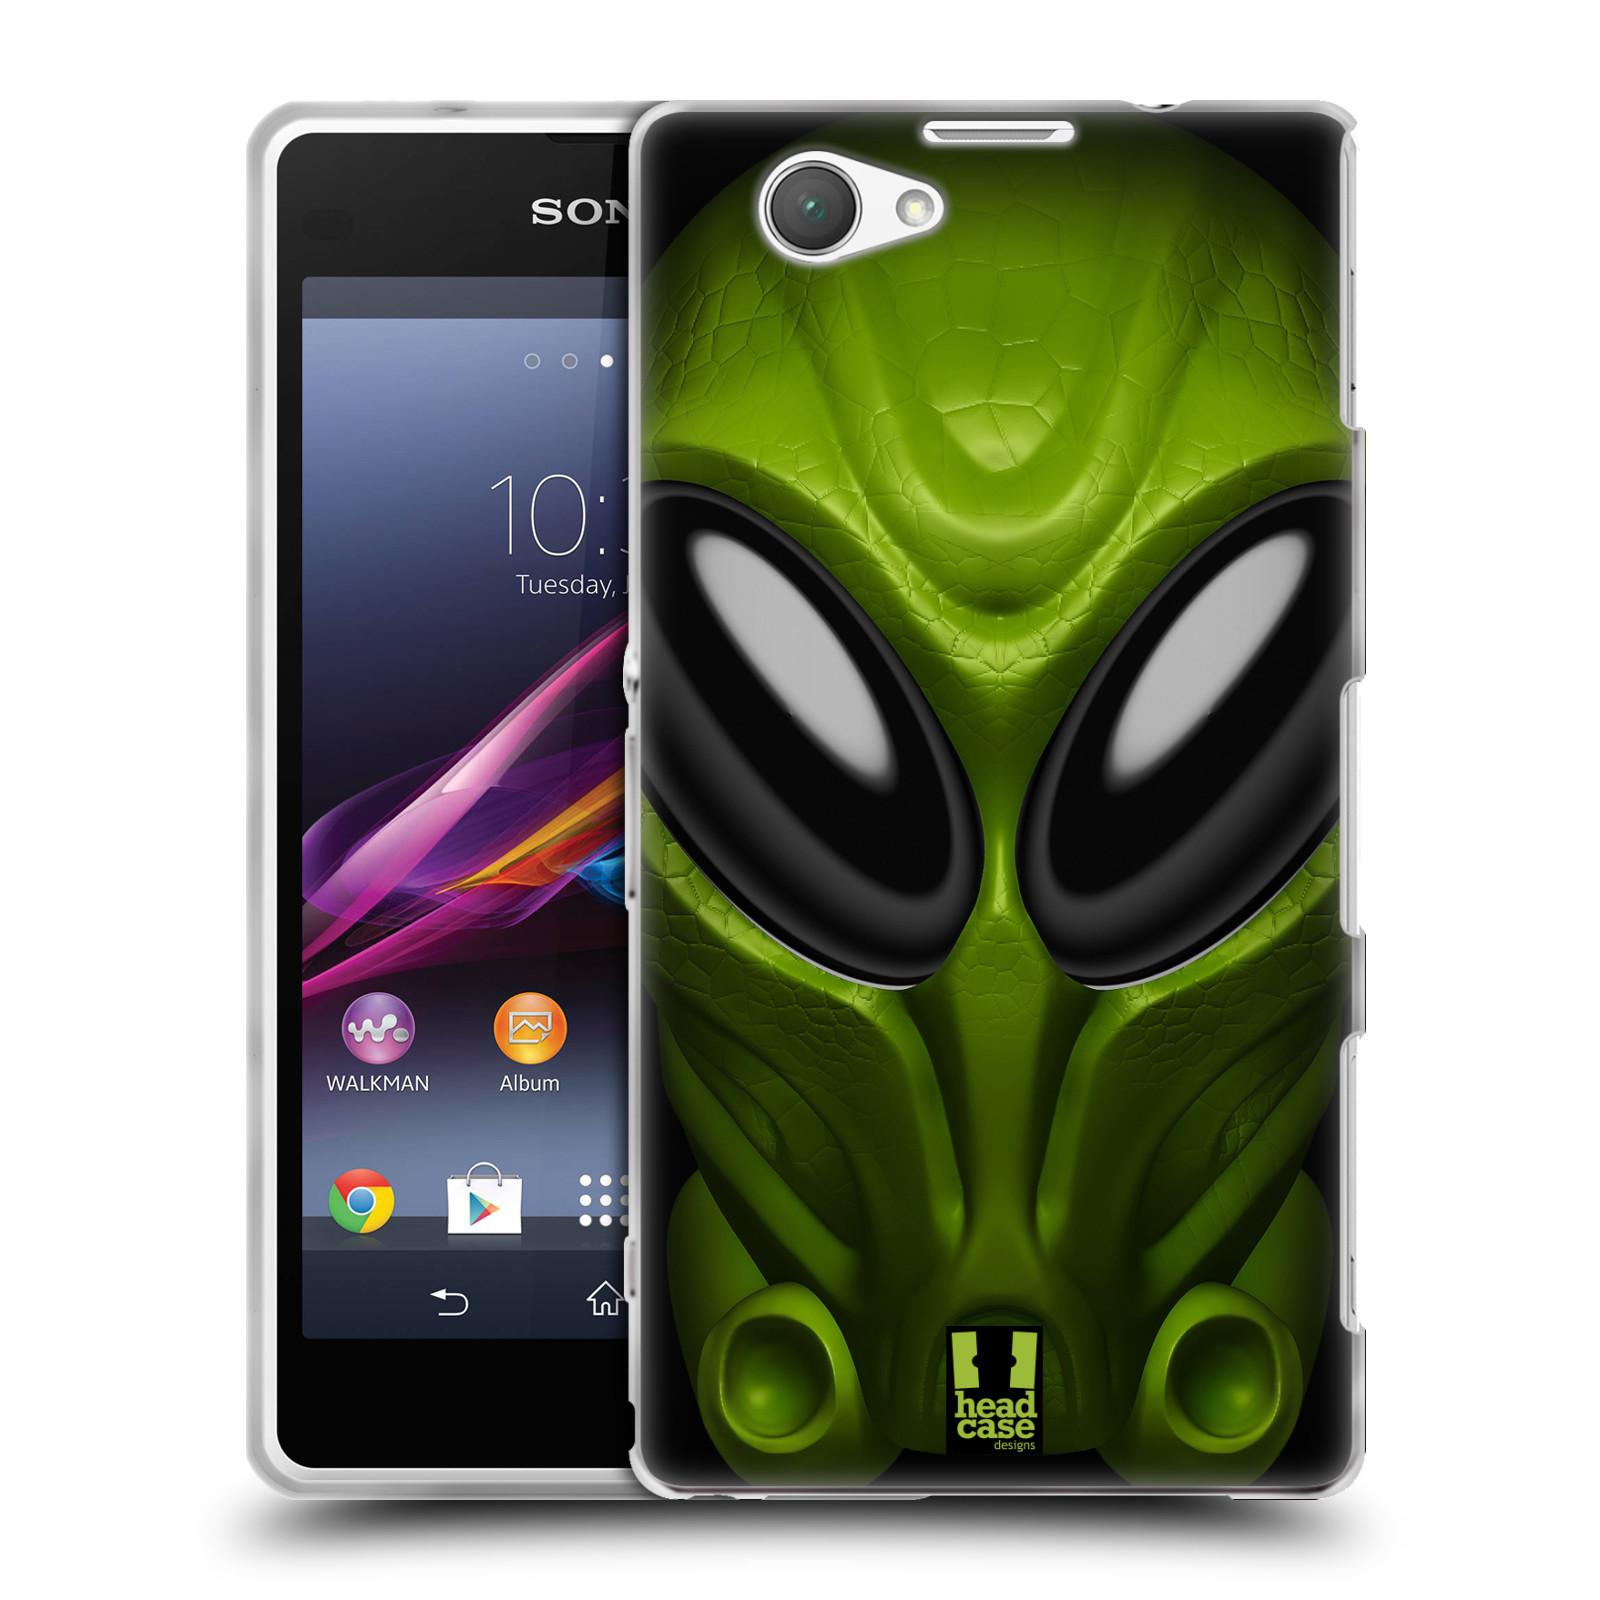 Silikonové pouzdro na mobil Sony Xperia Z1 Compact D5503 - Head Case - Ufoun Mastermind